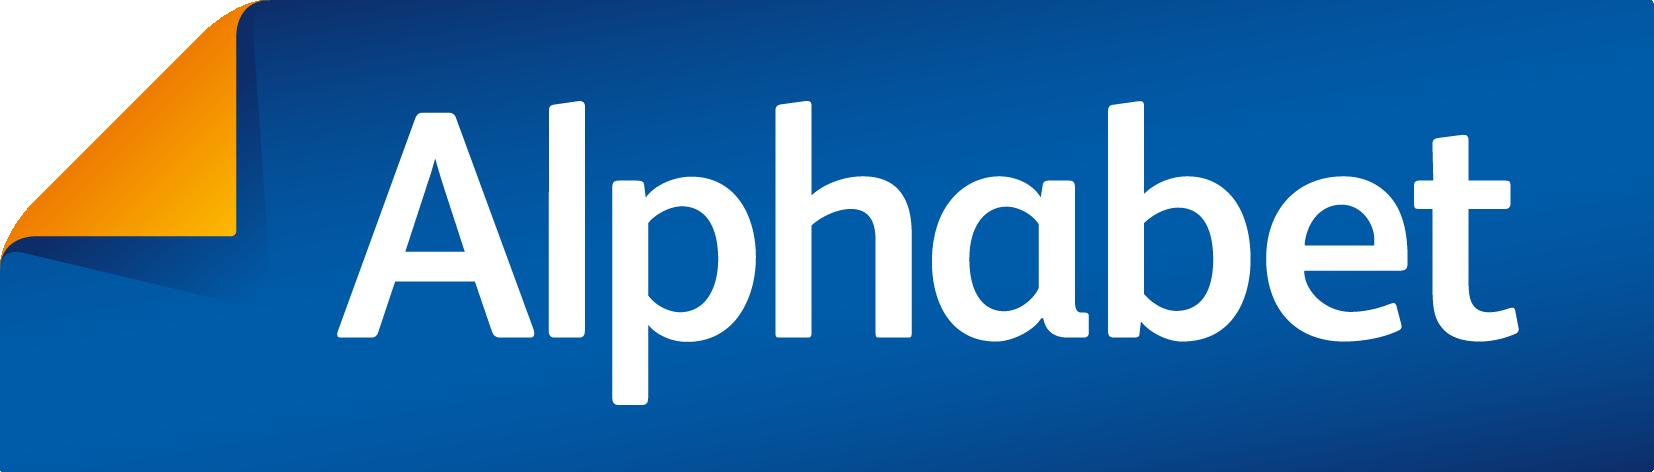 File:Alphabet.PNG.